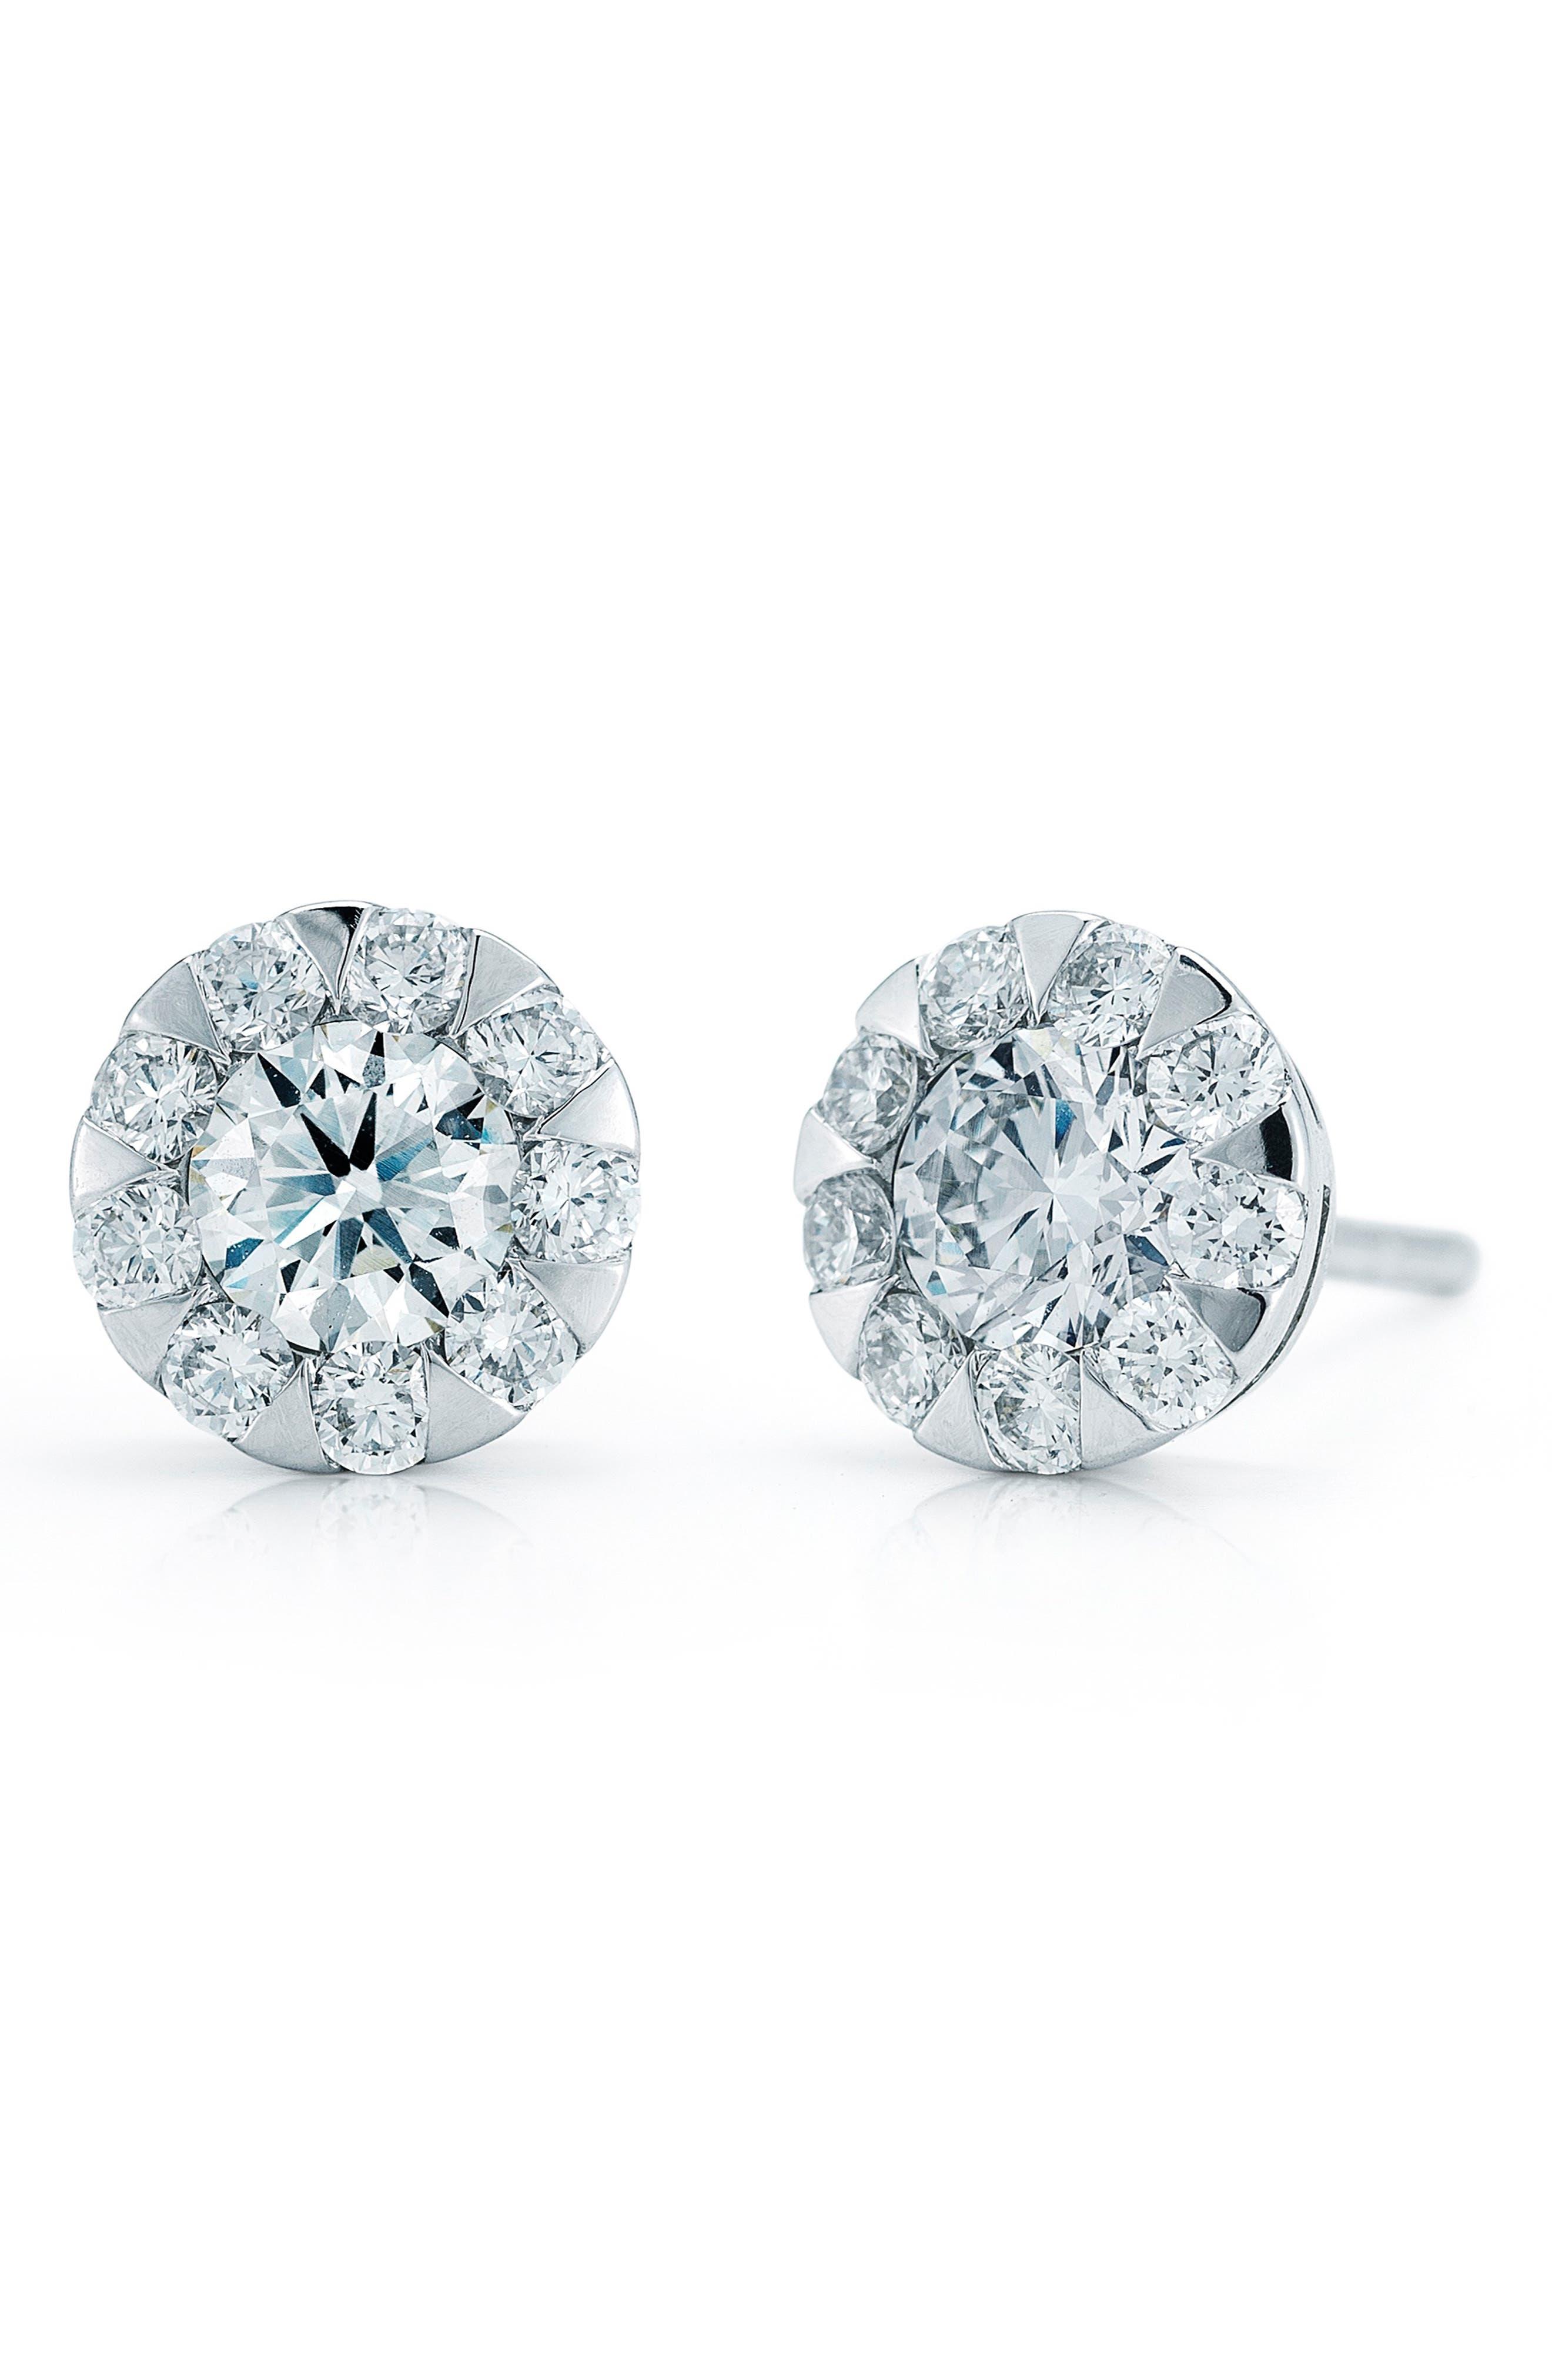 'Sunburst' Diamond Stud Earrings,                             Main thumbnail 1, color,                             710